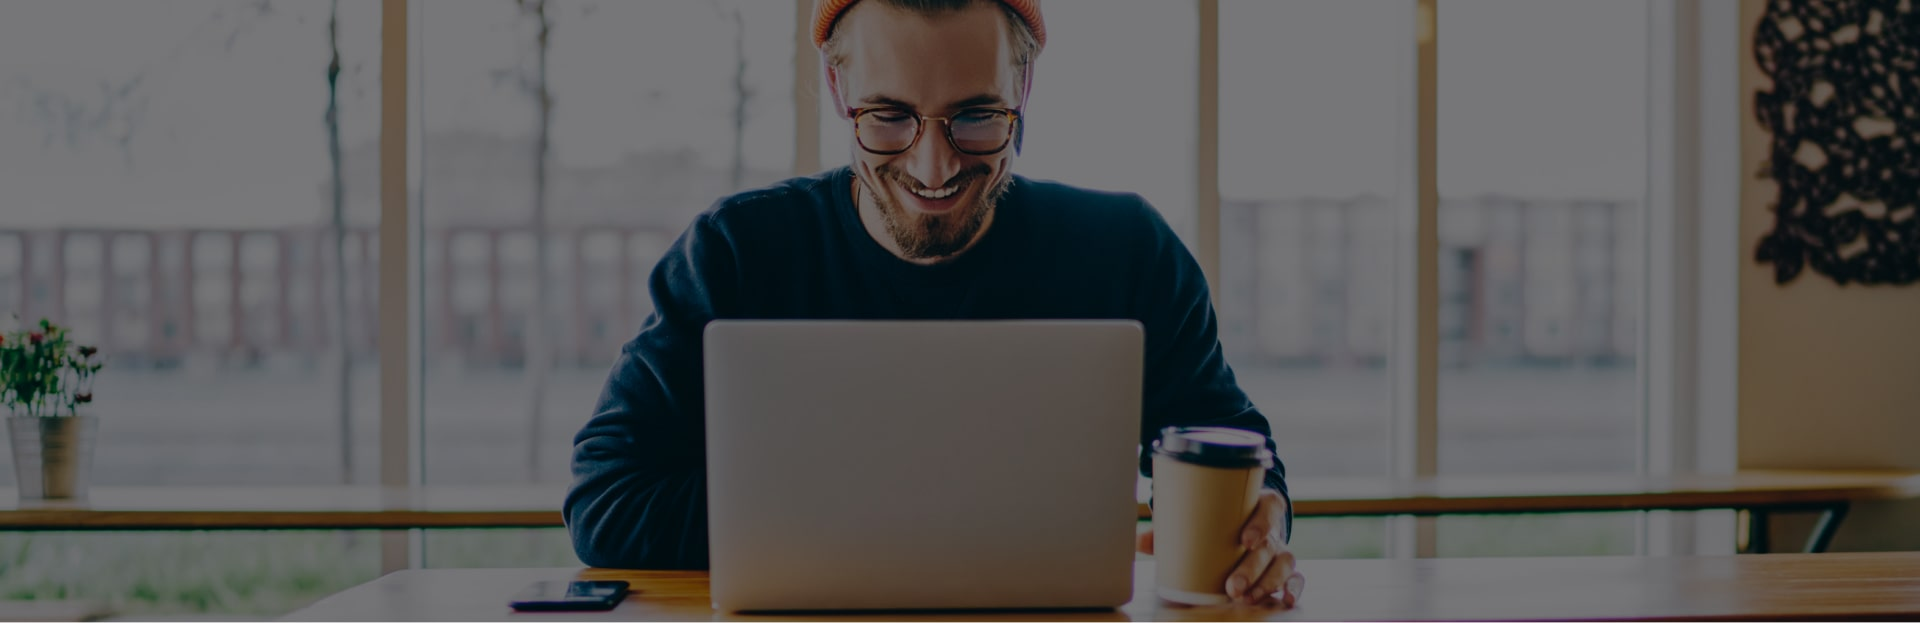 Blog de Marketing Digital M4C Academy